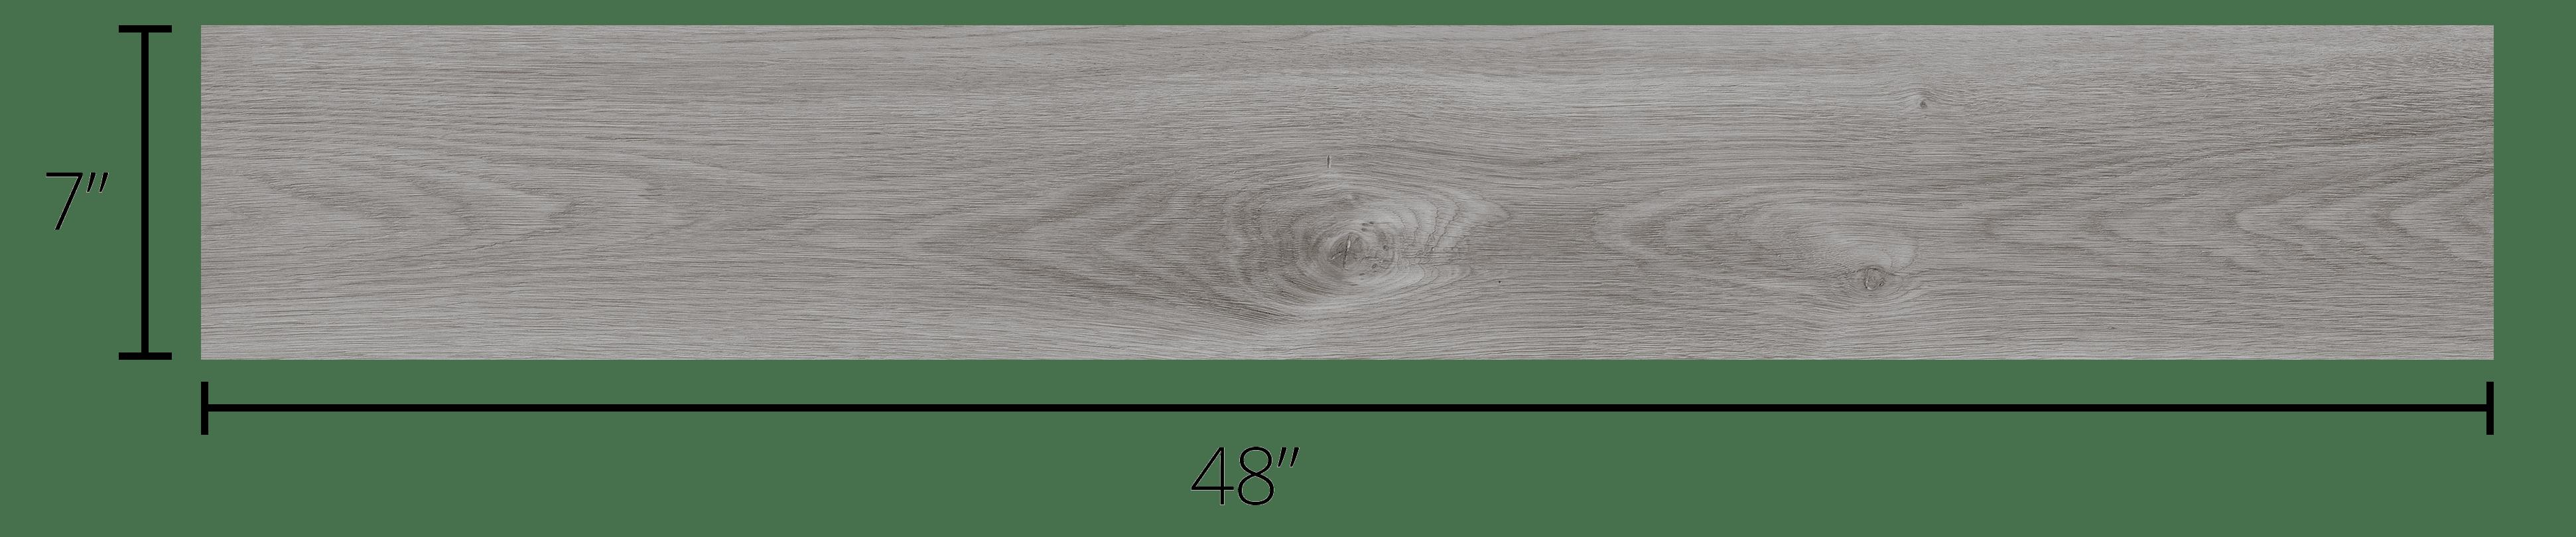 Large Vinyl Planks 7 x 48